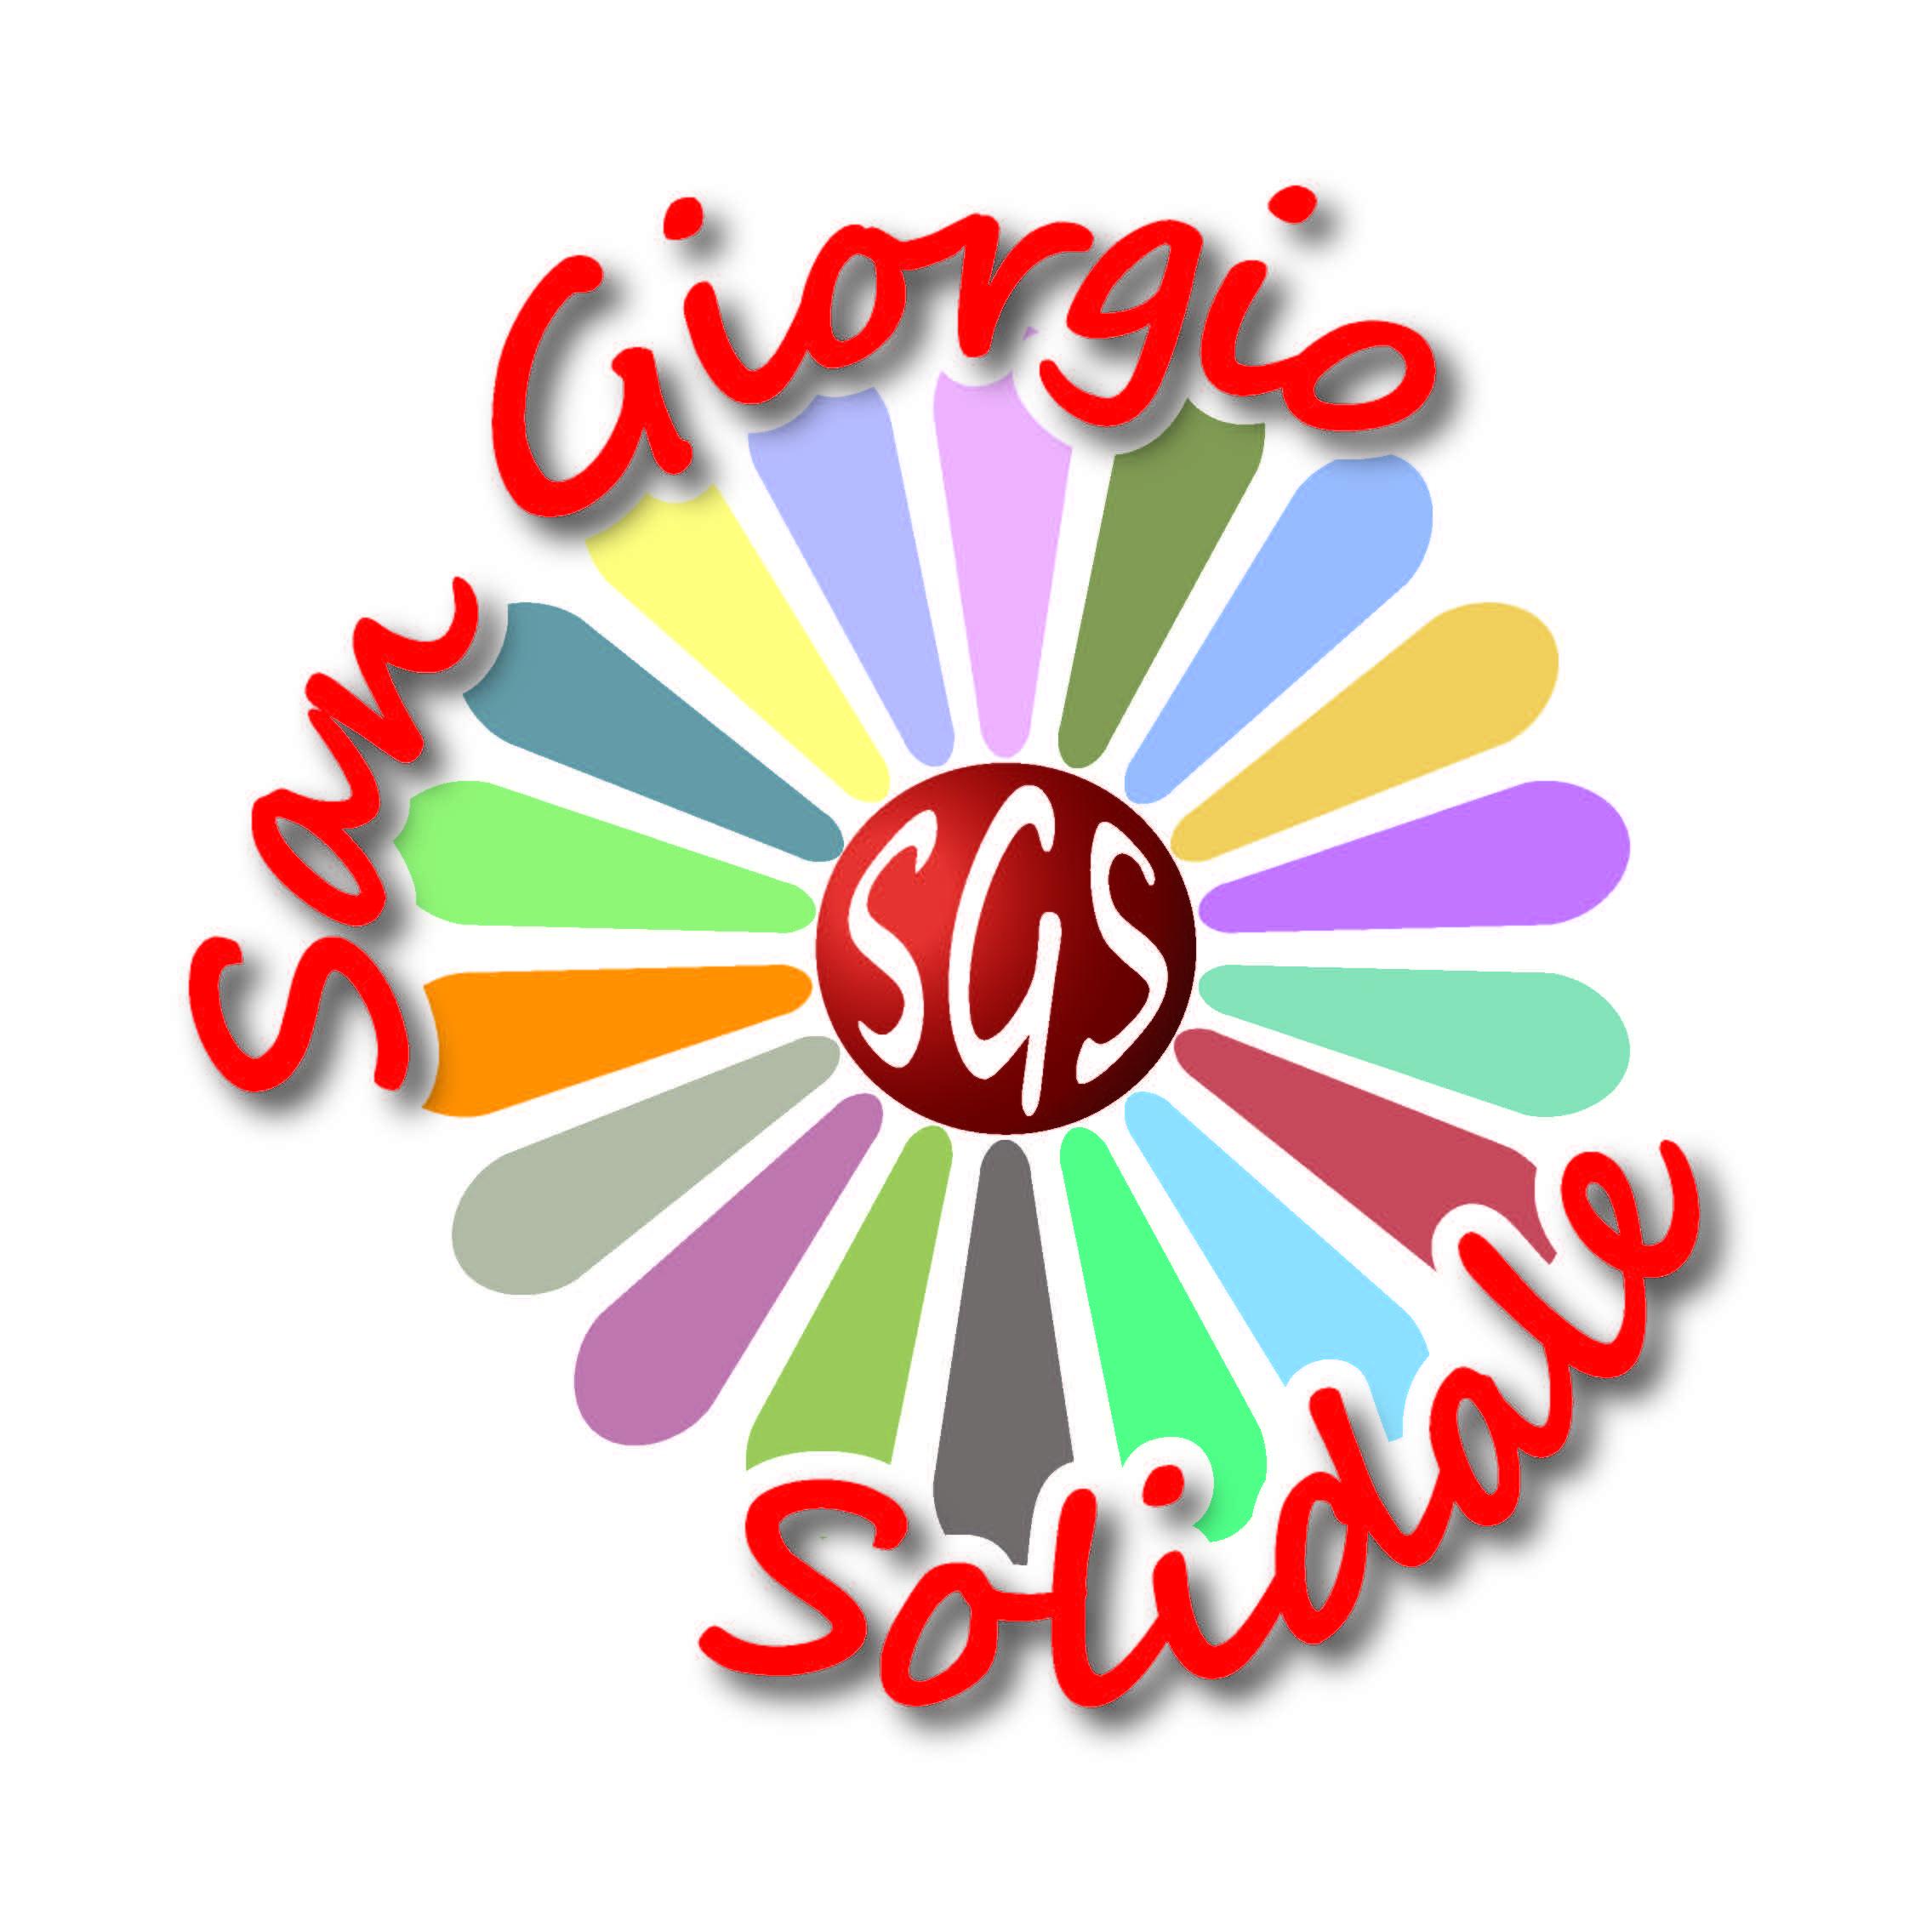 San Giorgio Solidale